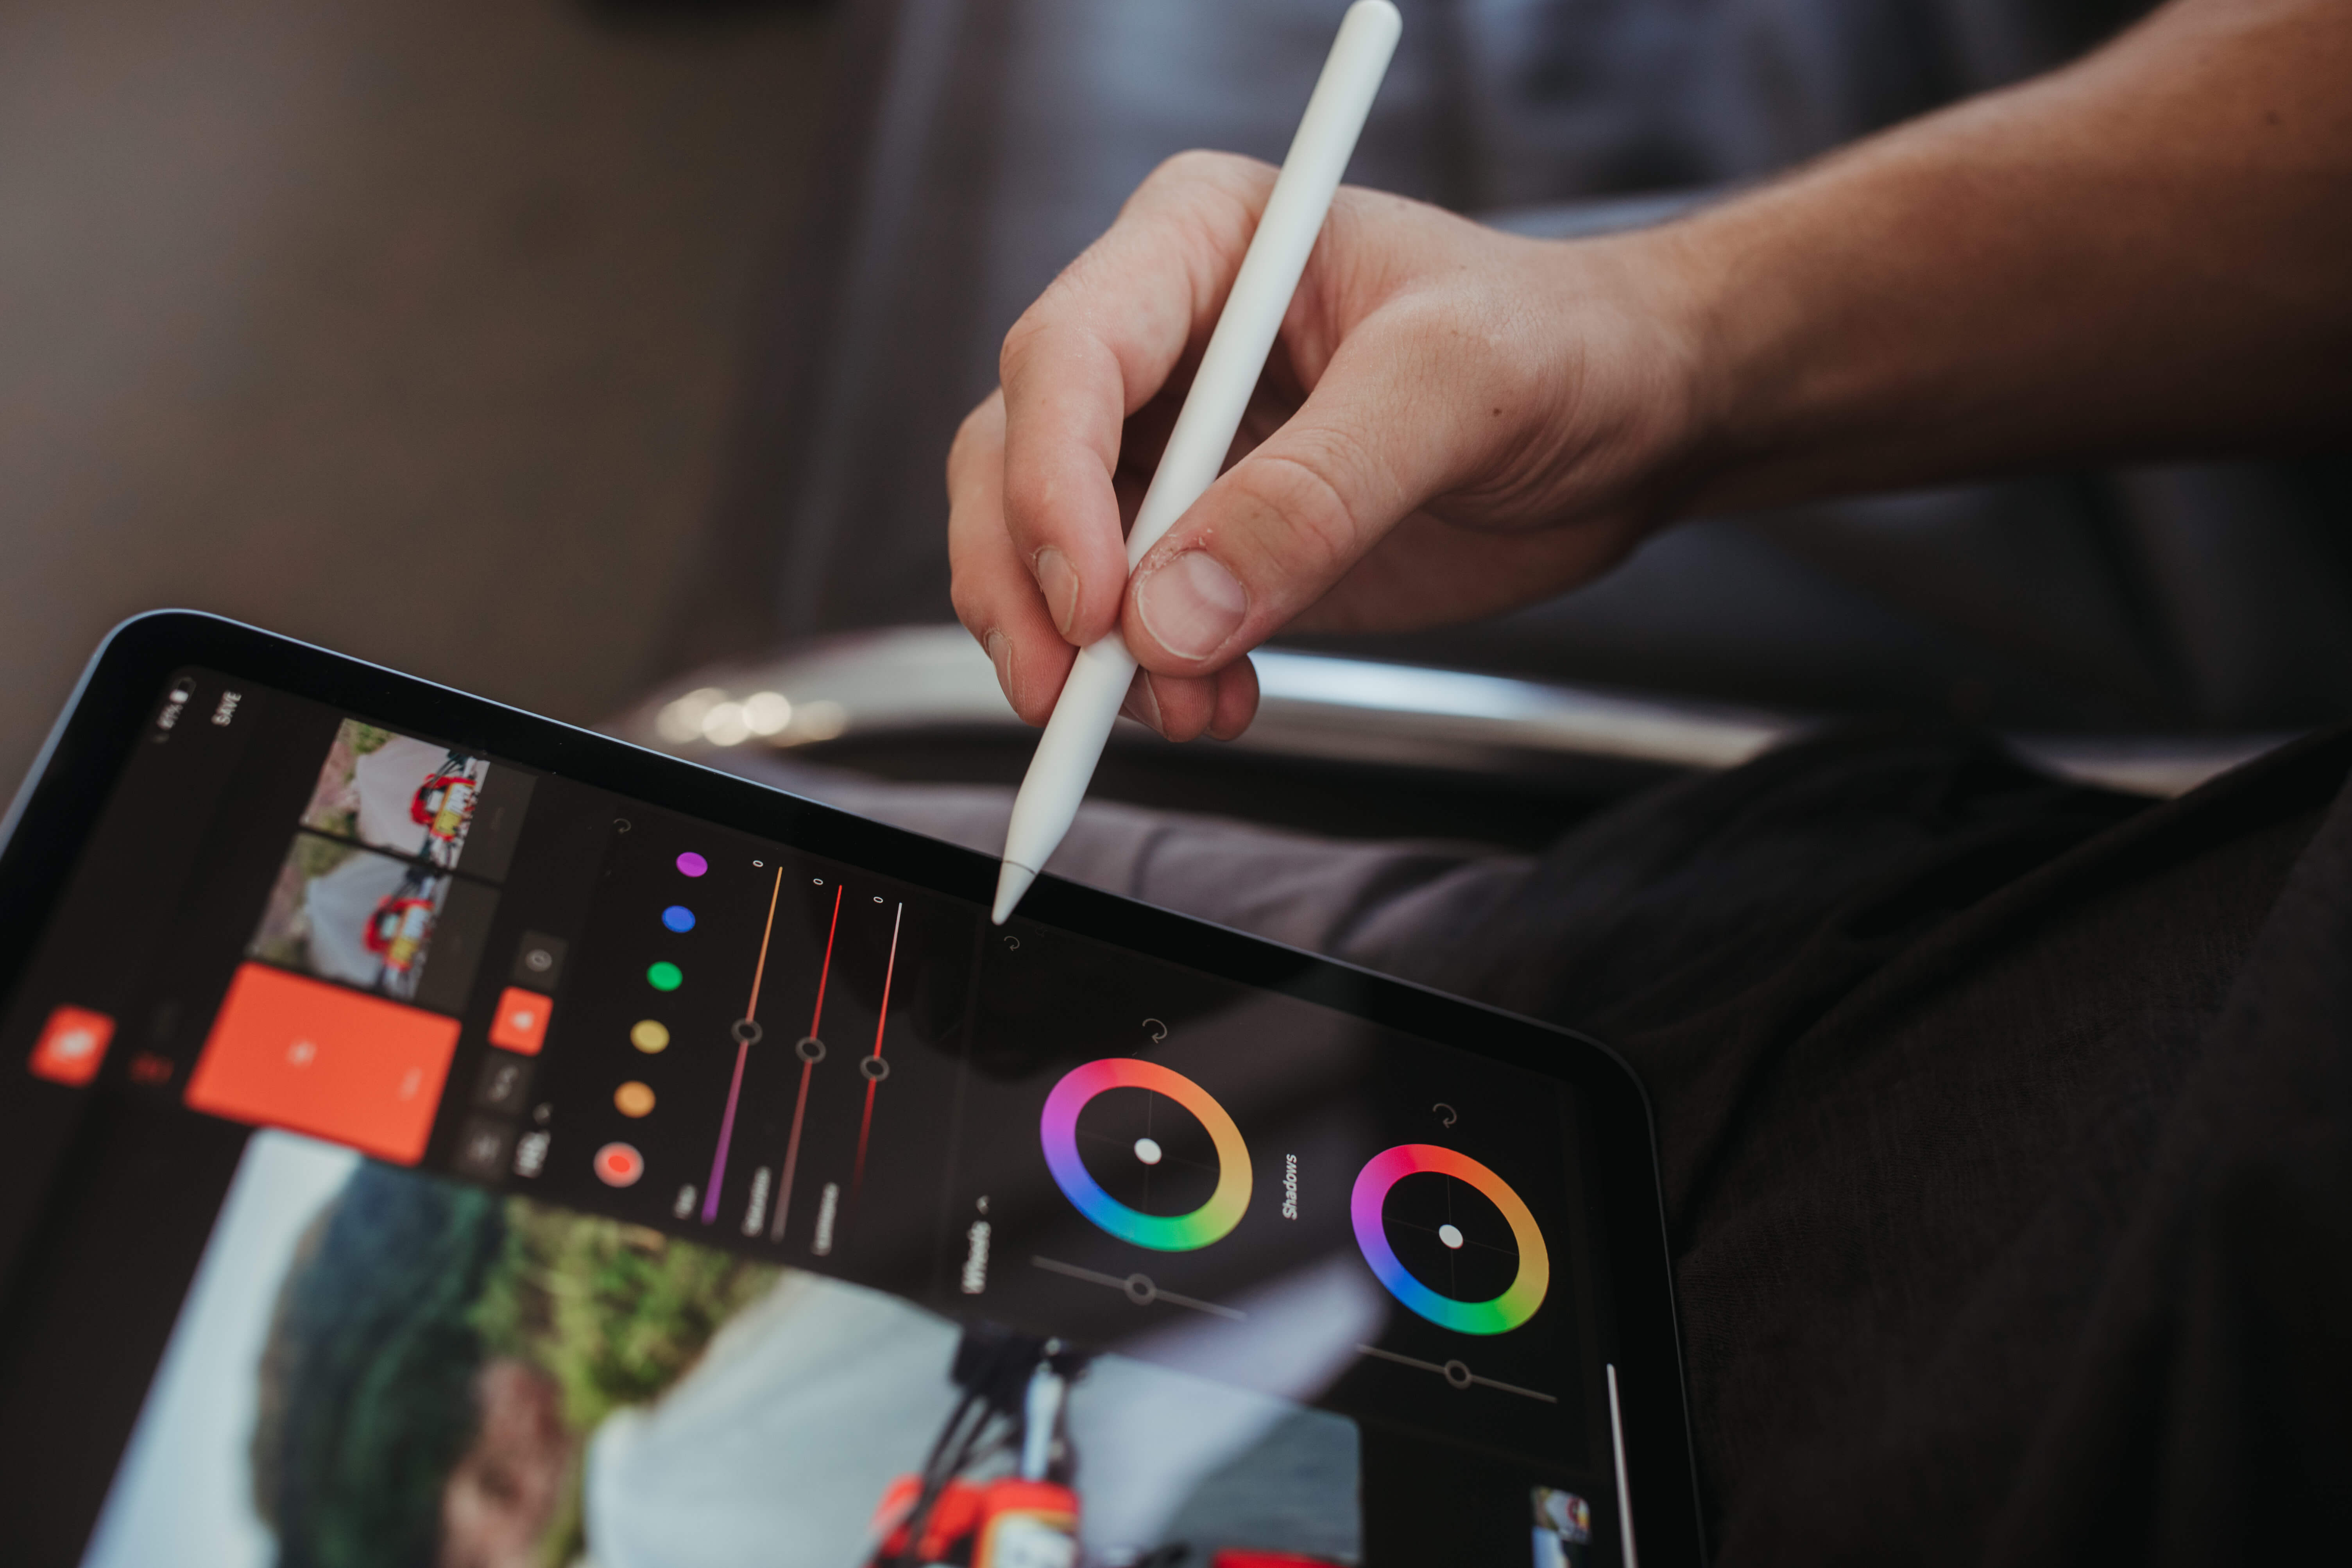 Hand uses apple pencil to adjust color wheels on the Grain iPad app.